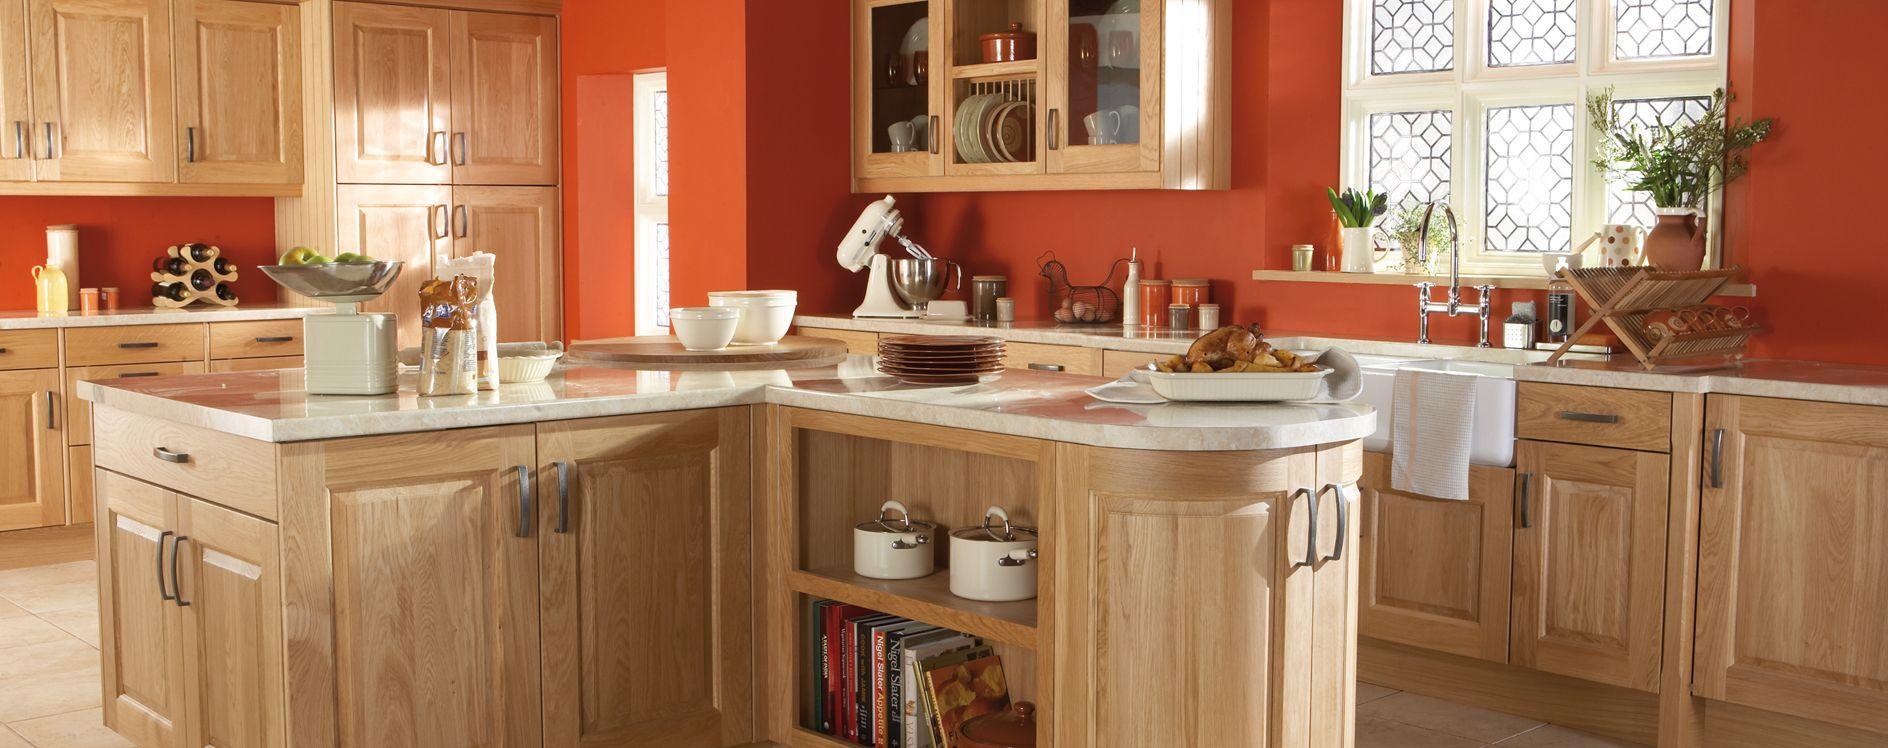 Classic Solid Oak Kitchen Design And Nonstandard Door Sizes New Standard Kitchen Design Inspiration Design